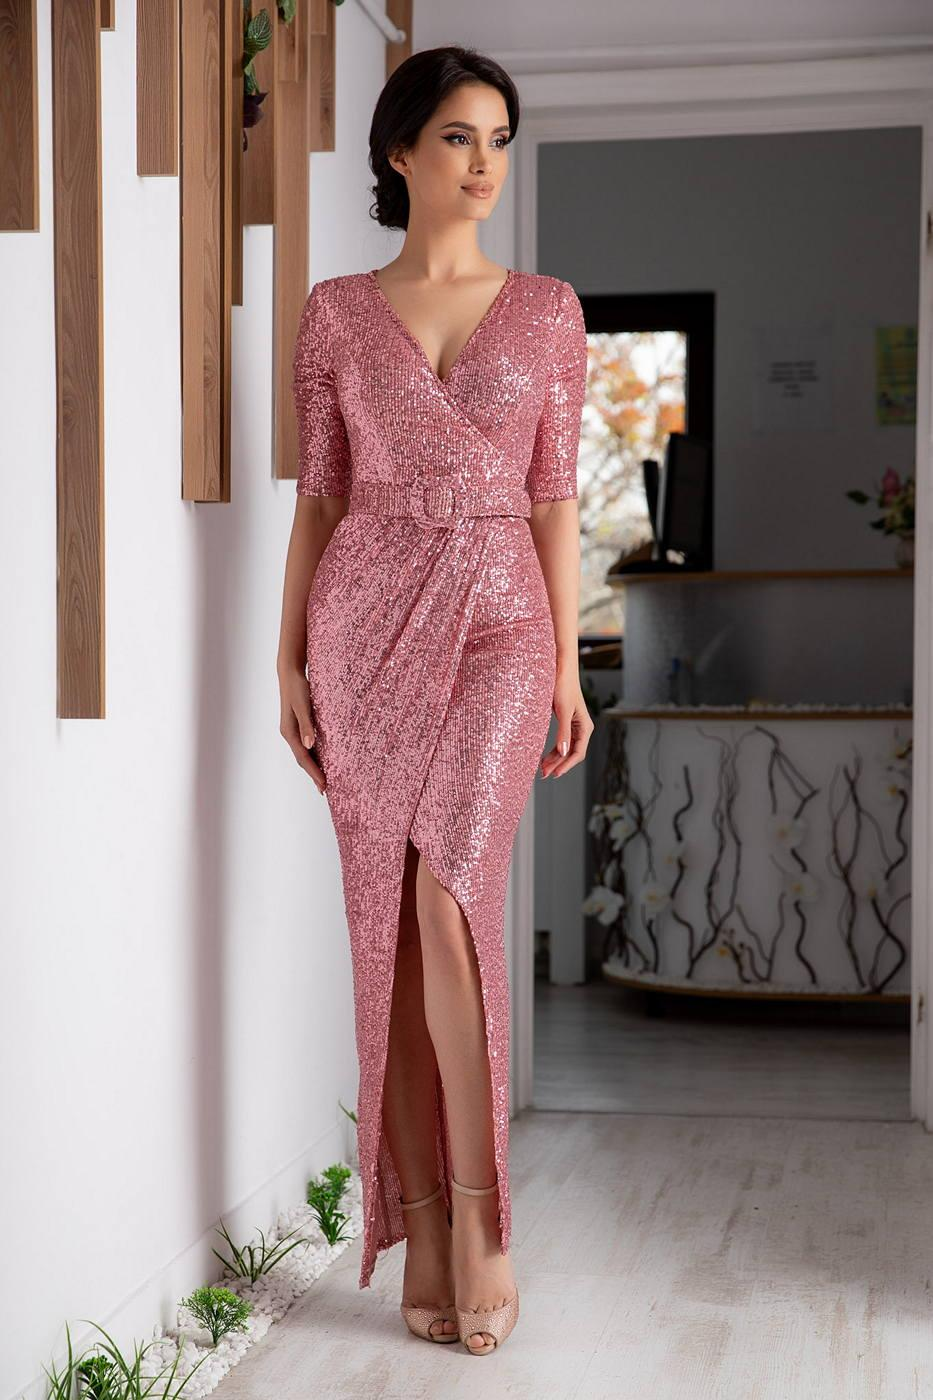 Extasy Pink Dress